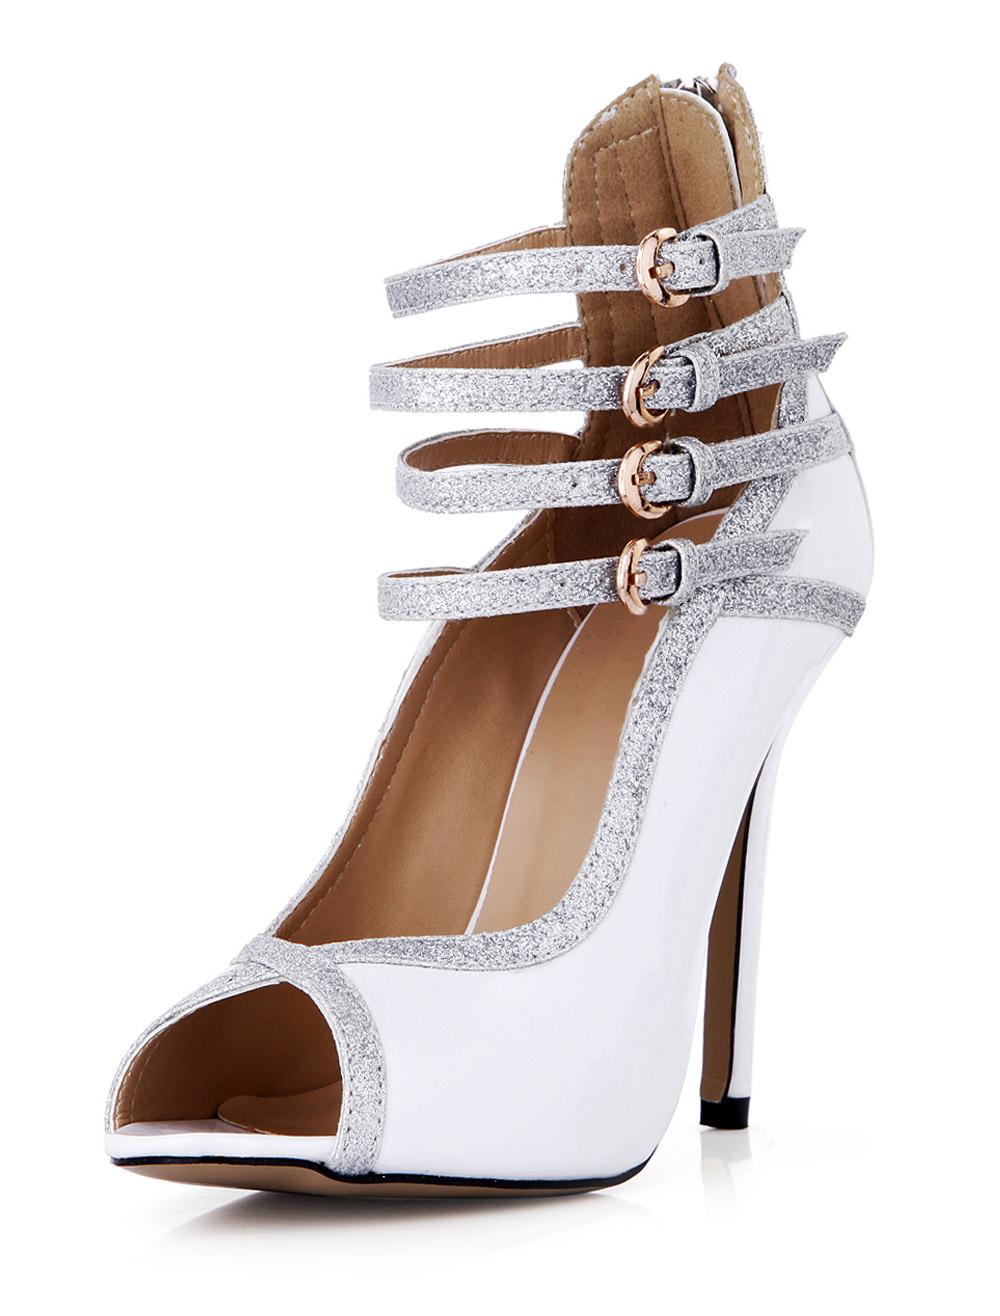 Fabulous White Stiletto Heel Buckles Patent PU Peep Toe High Heels